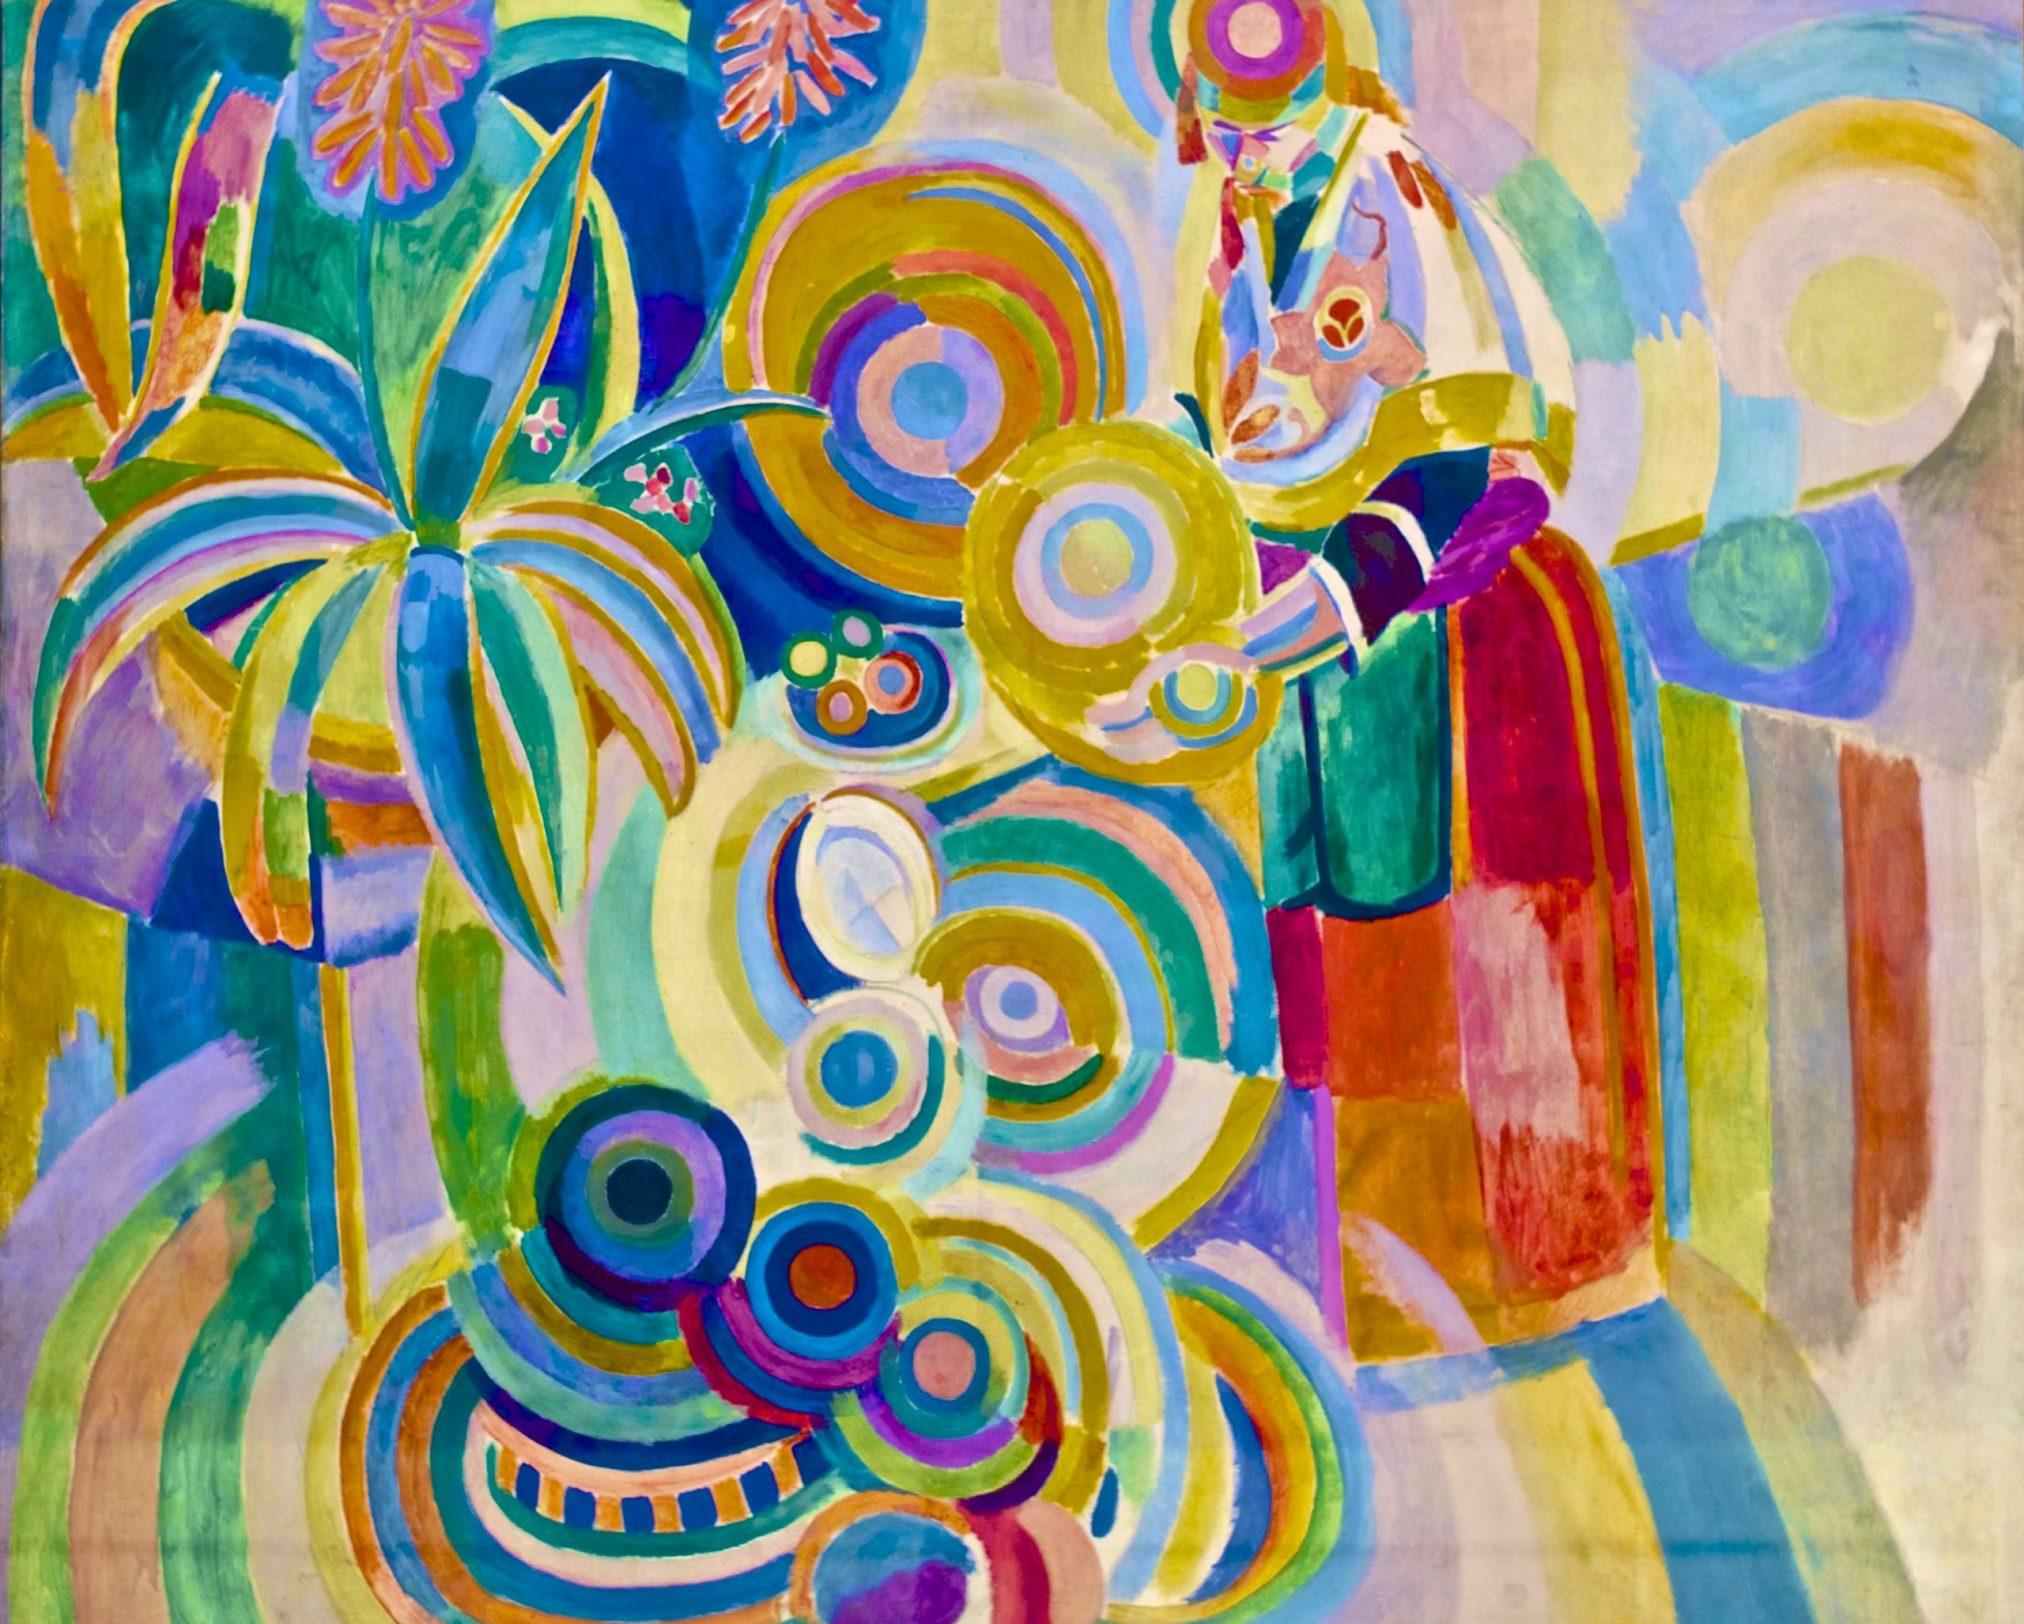 La_grande_portugaise_(1916)_-_Robert_Delaunay_(1885_-_1941)_(24881827375)